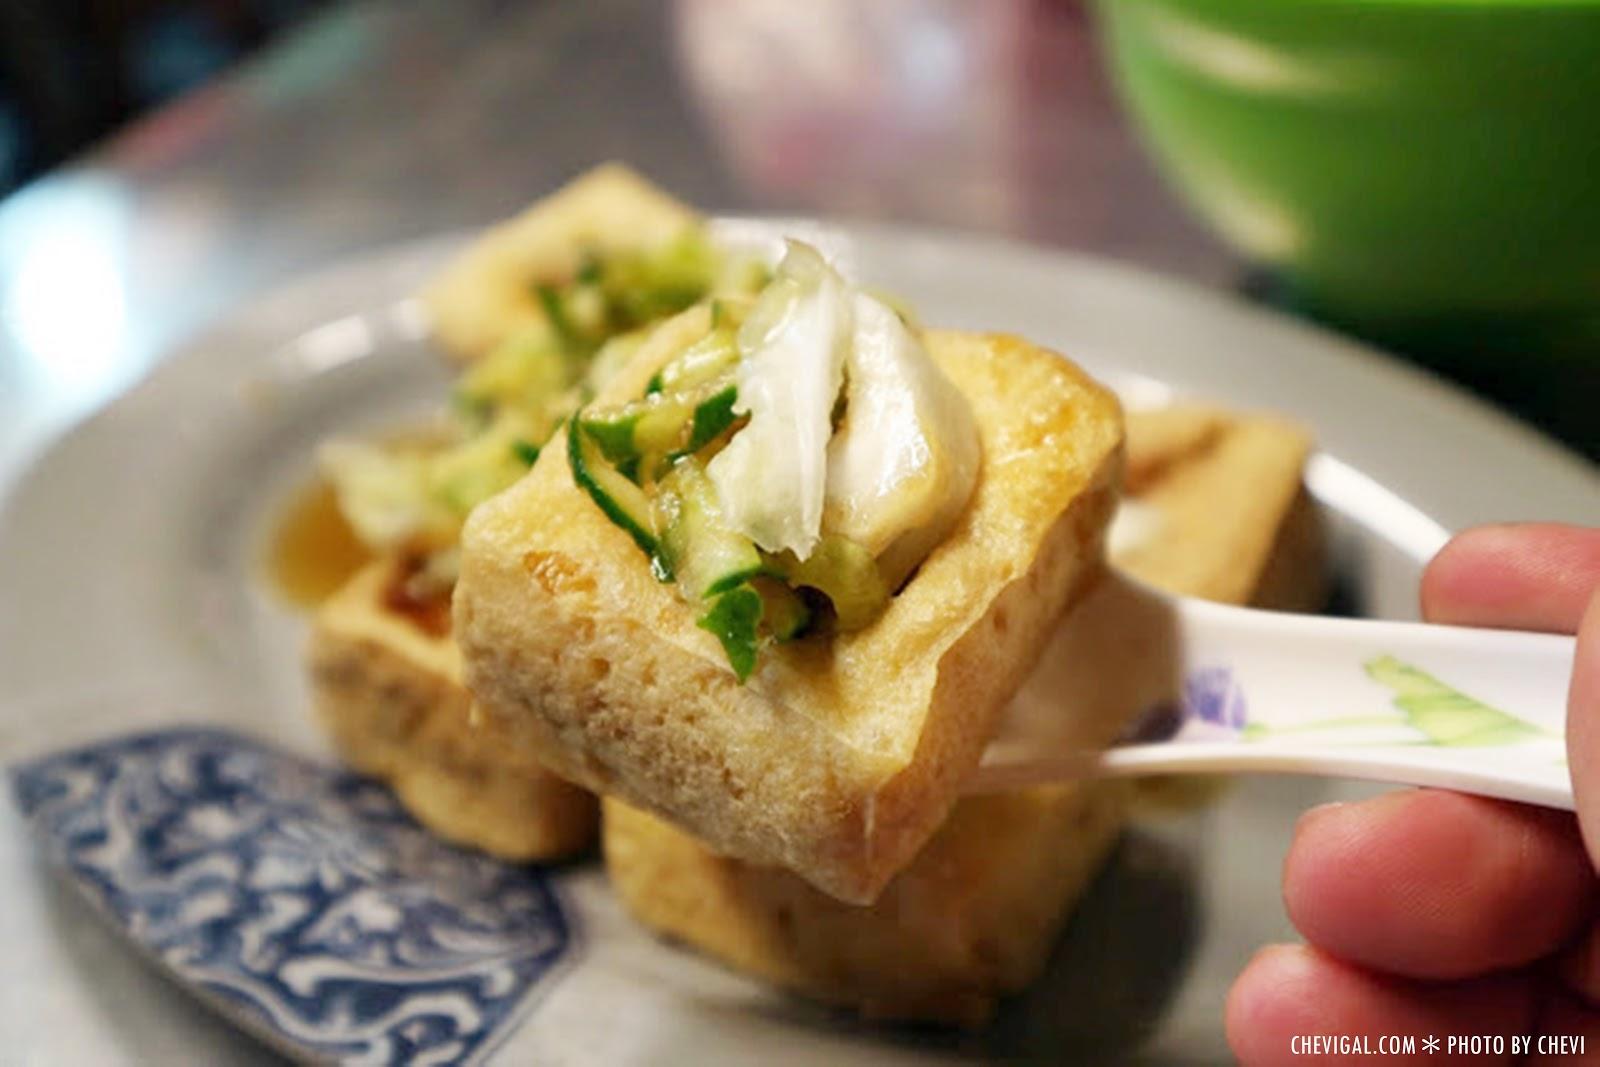 IMG 0642 - 台中烏日│正老牌太祖魷魚羹。隱藏多時的在地美味。臭豆腐終於強勢回歸啦!